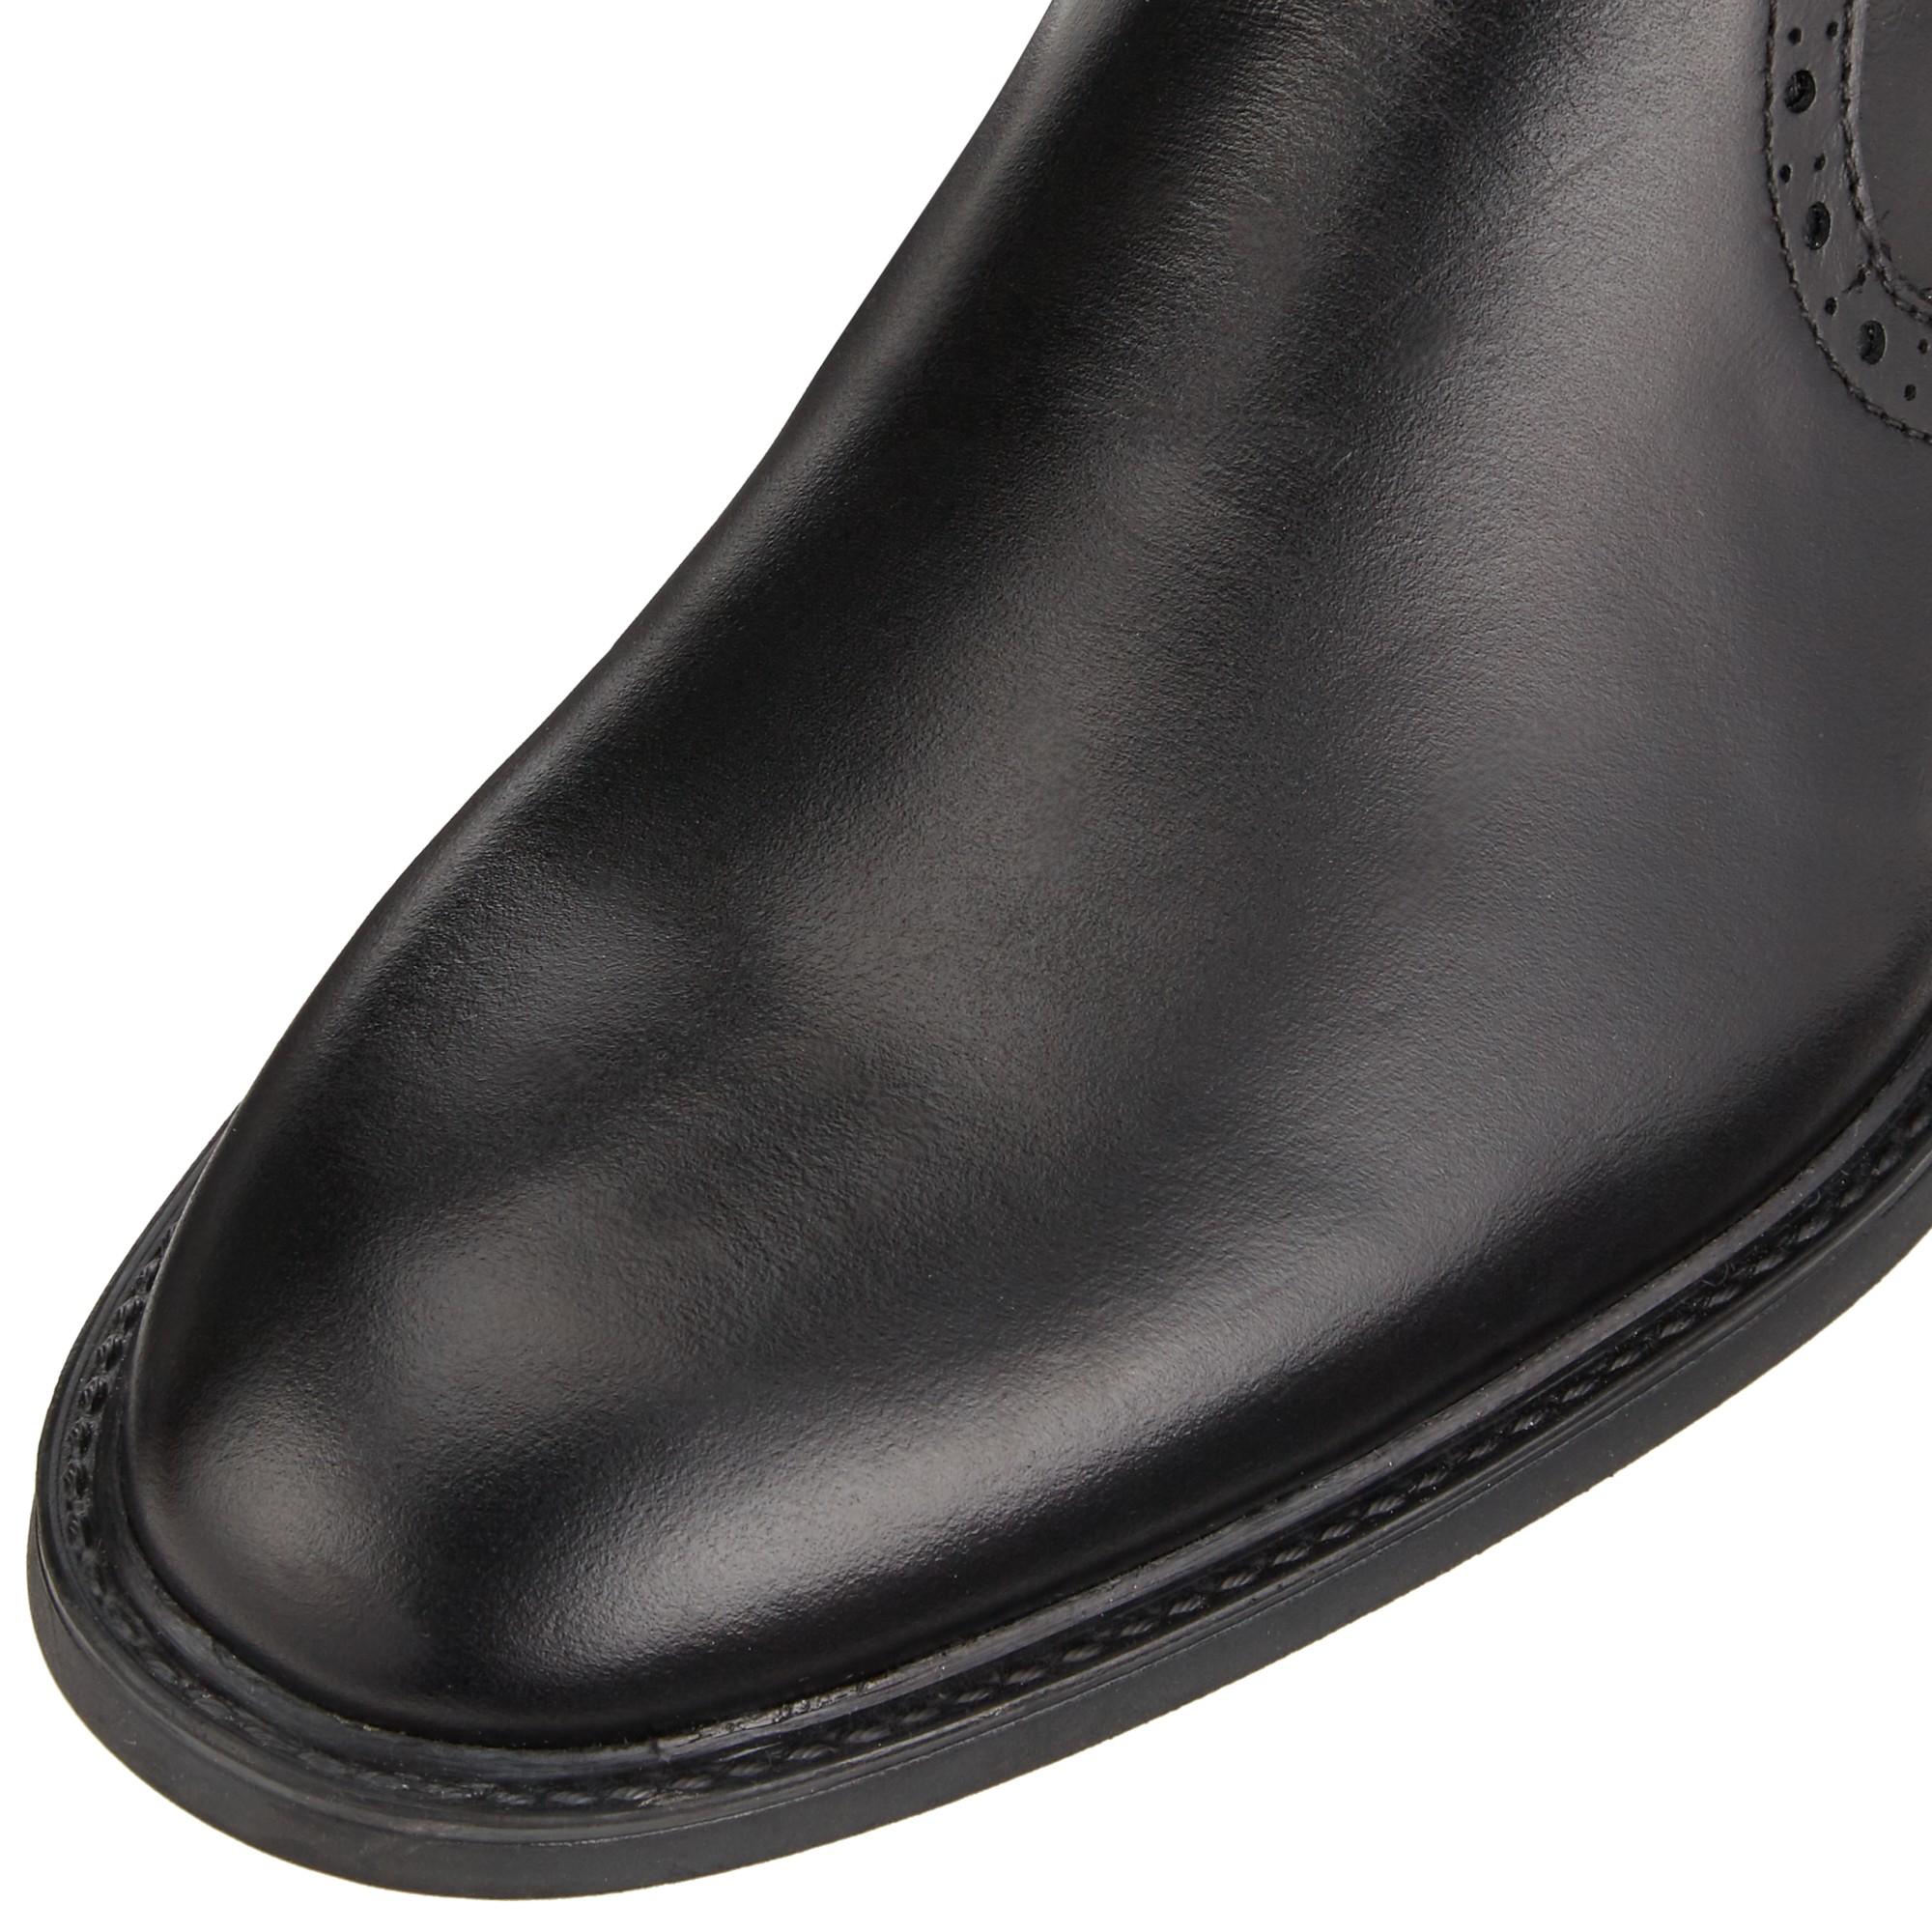 John Lewis Baker Long Leather Knee Boots in Black